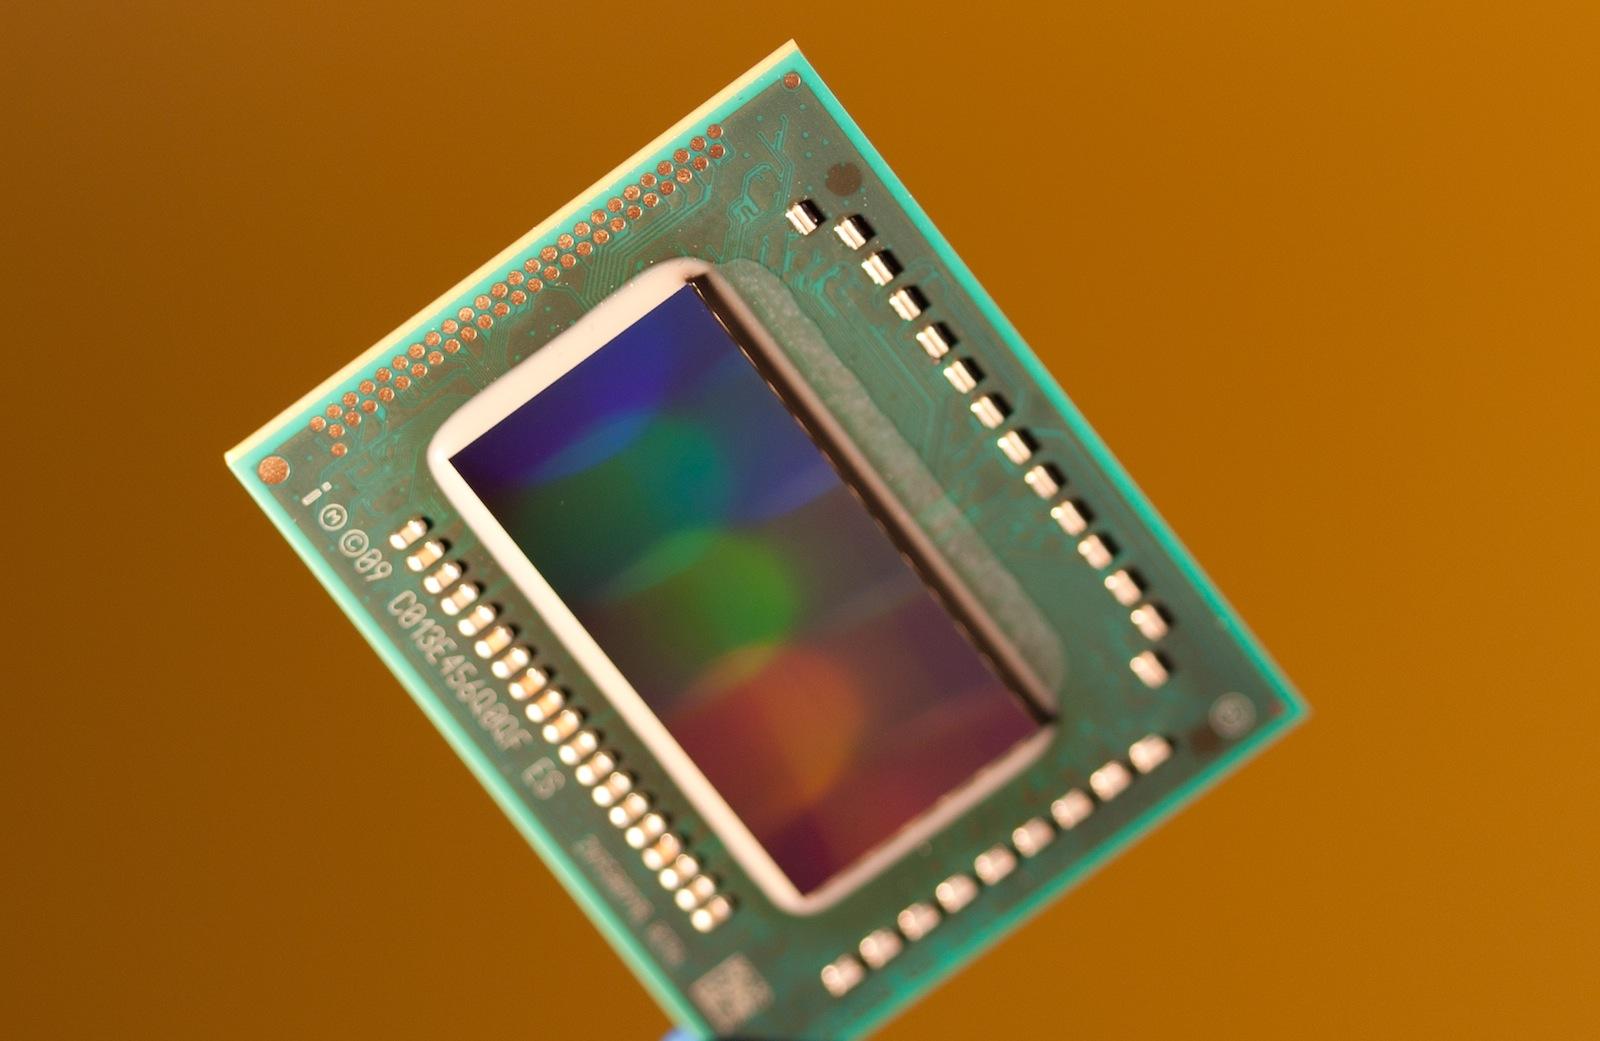 core i7 Facebook mac mini 23ghz quad-core intel core i7 on facebook twitter mac mini 23ghz quad-core intel core i7 on twitter.